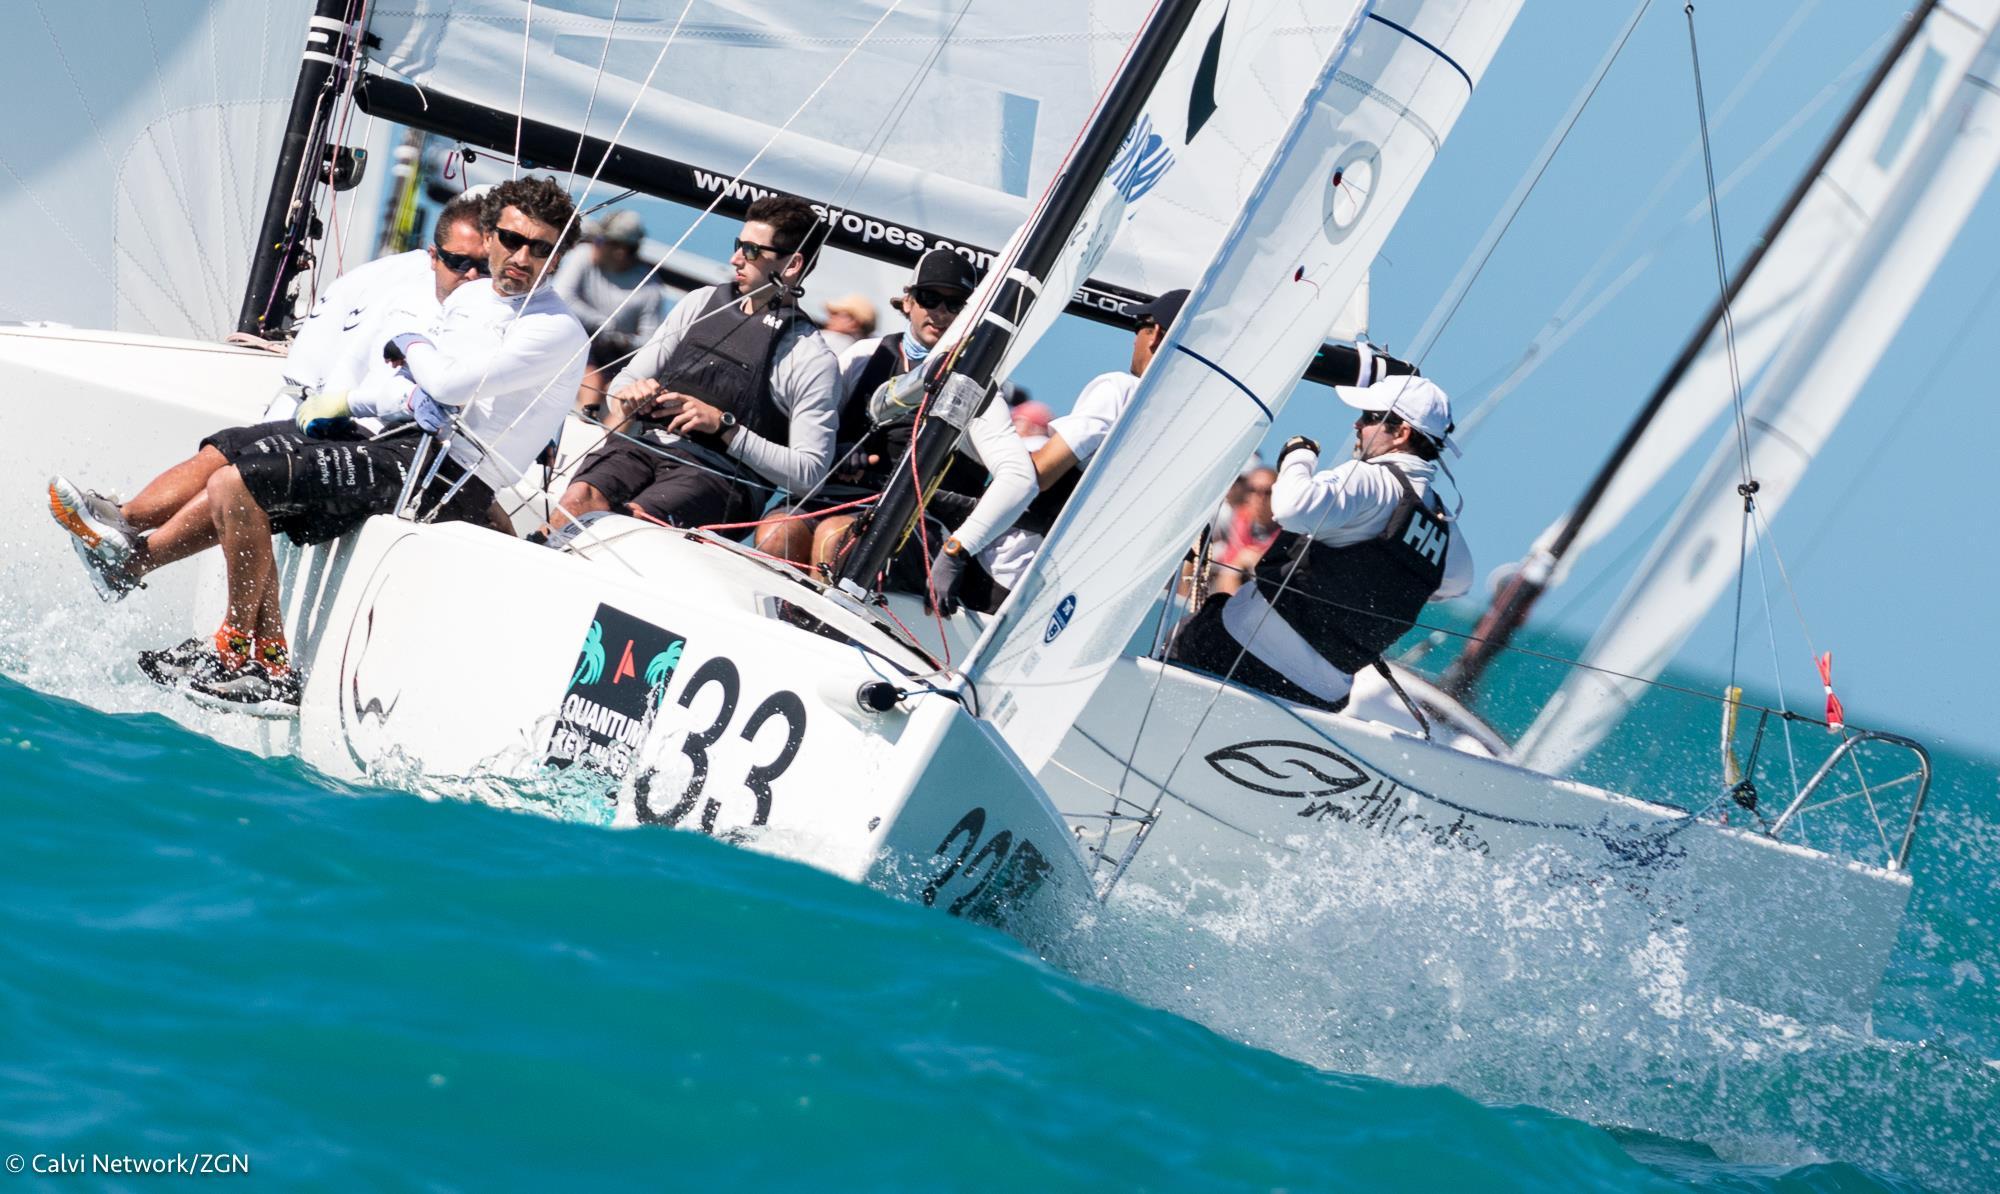 Calvi Network - Quantum Key West Race Week